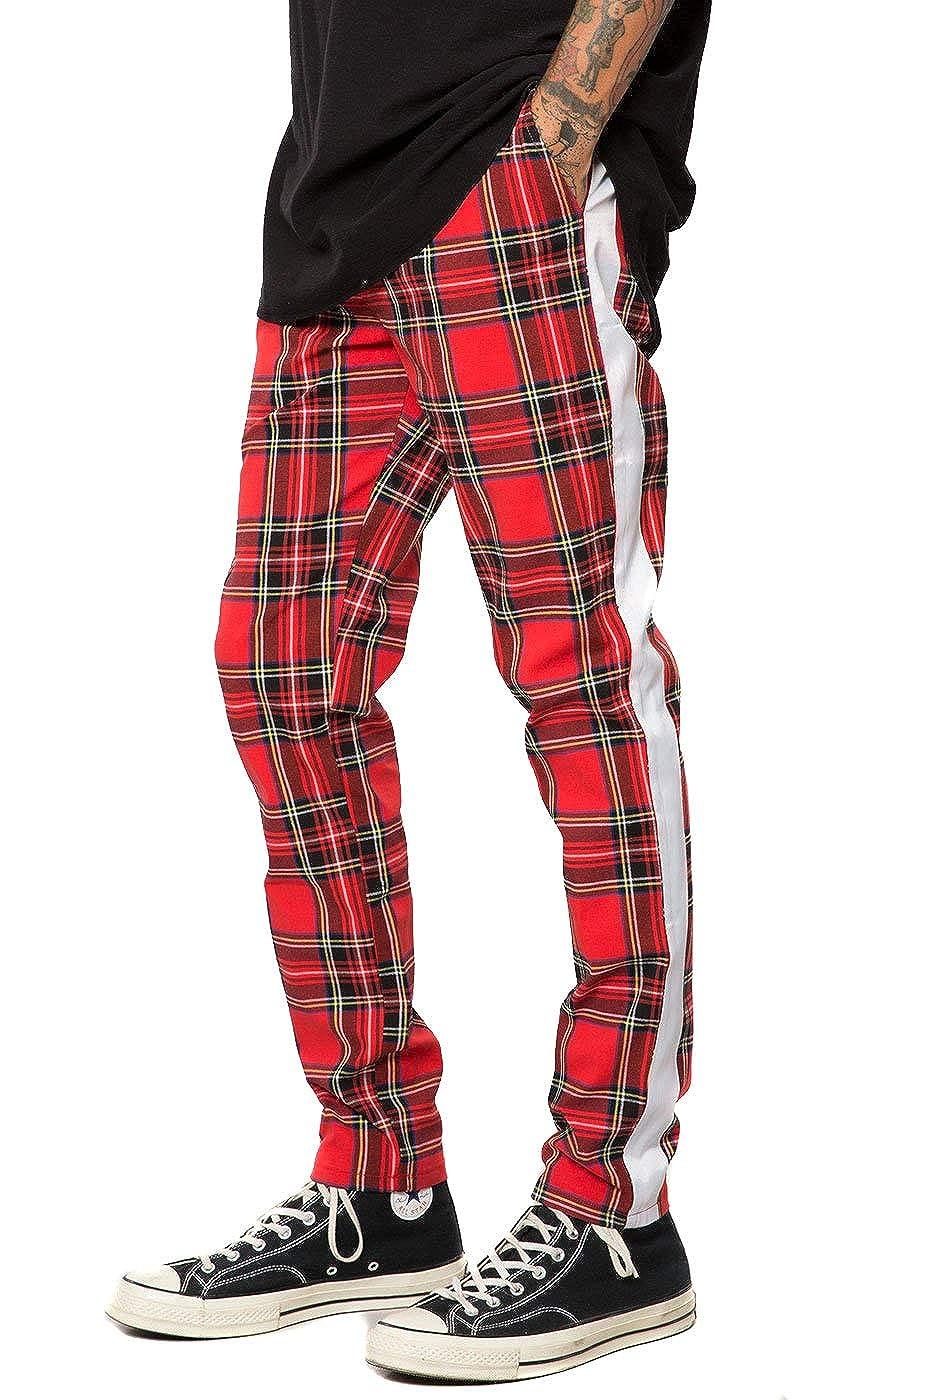 a1e3081c Amazon.com: Elwood Men's Tartan Plaid Skinny Stretch Side Stripe ...